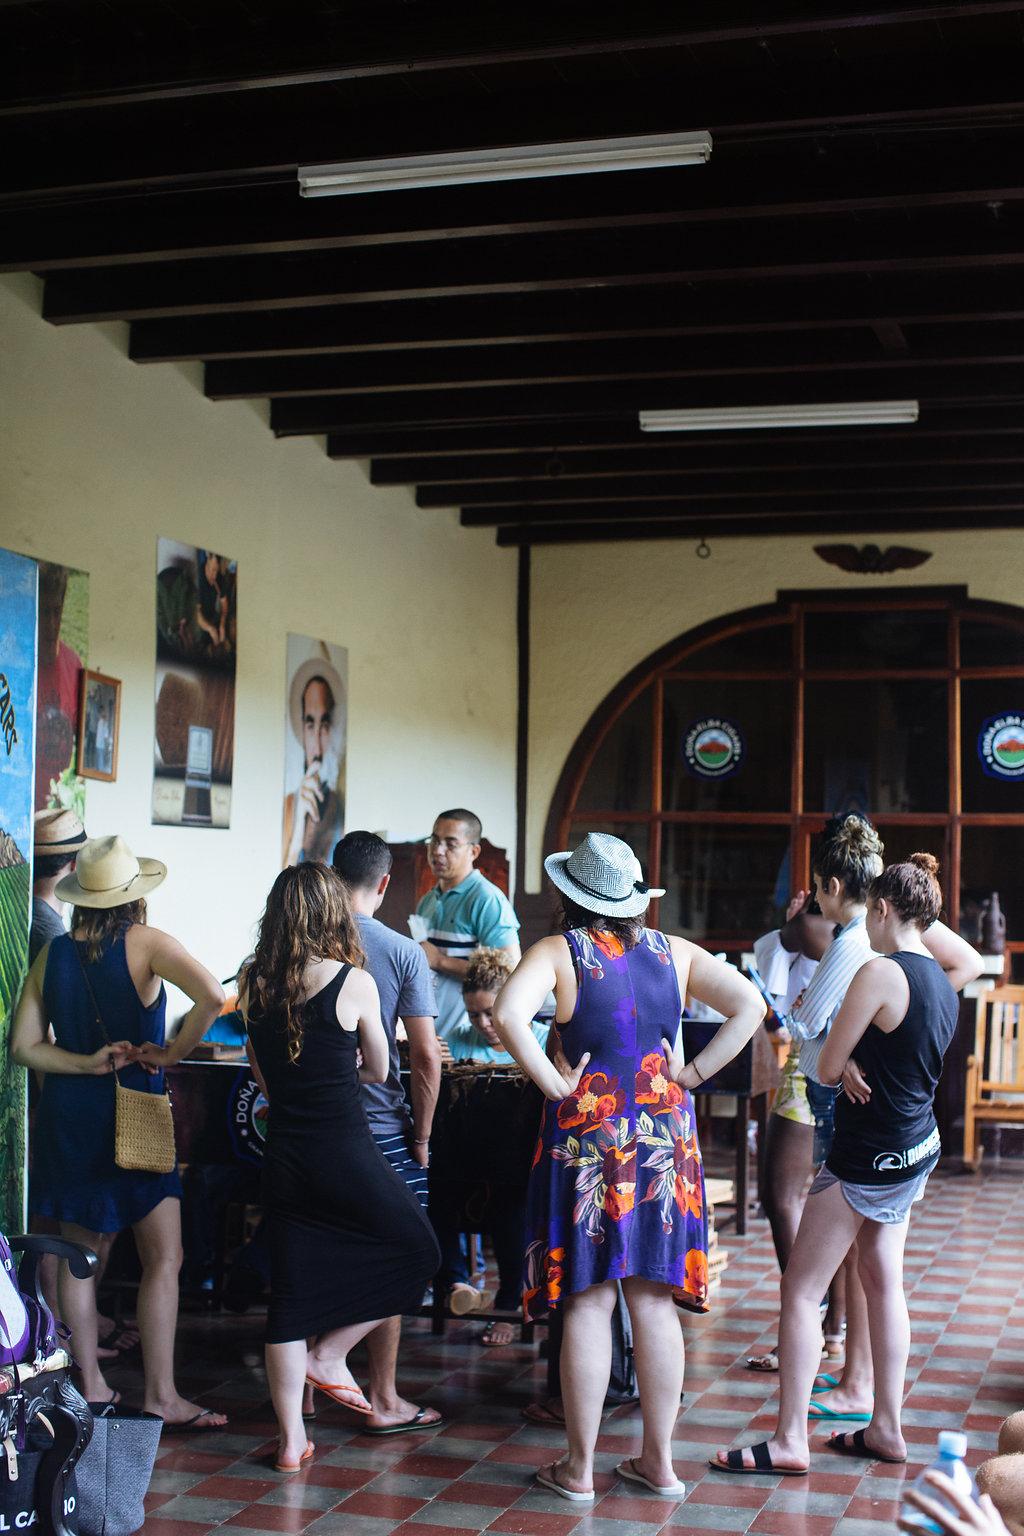 nicaragua-granada-donaelba-cigar-shop.jpg